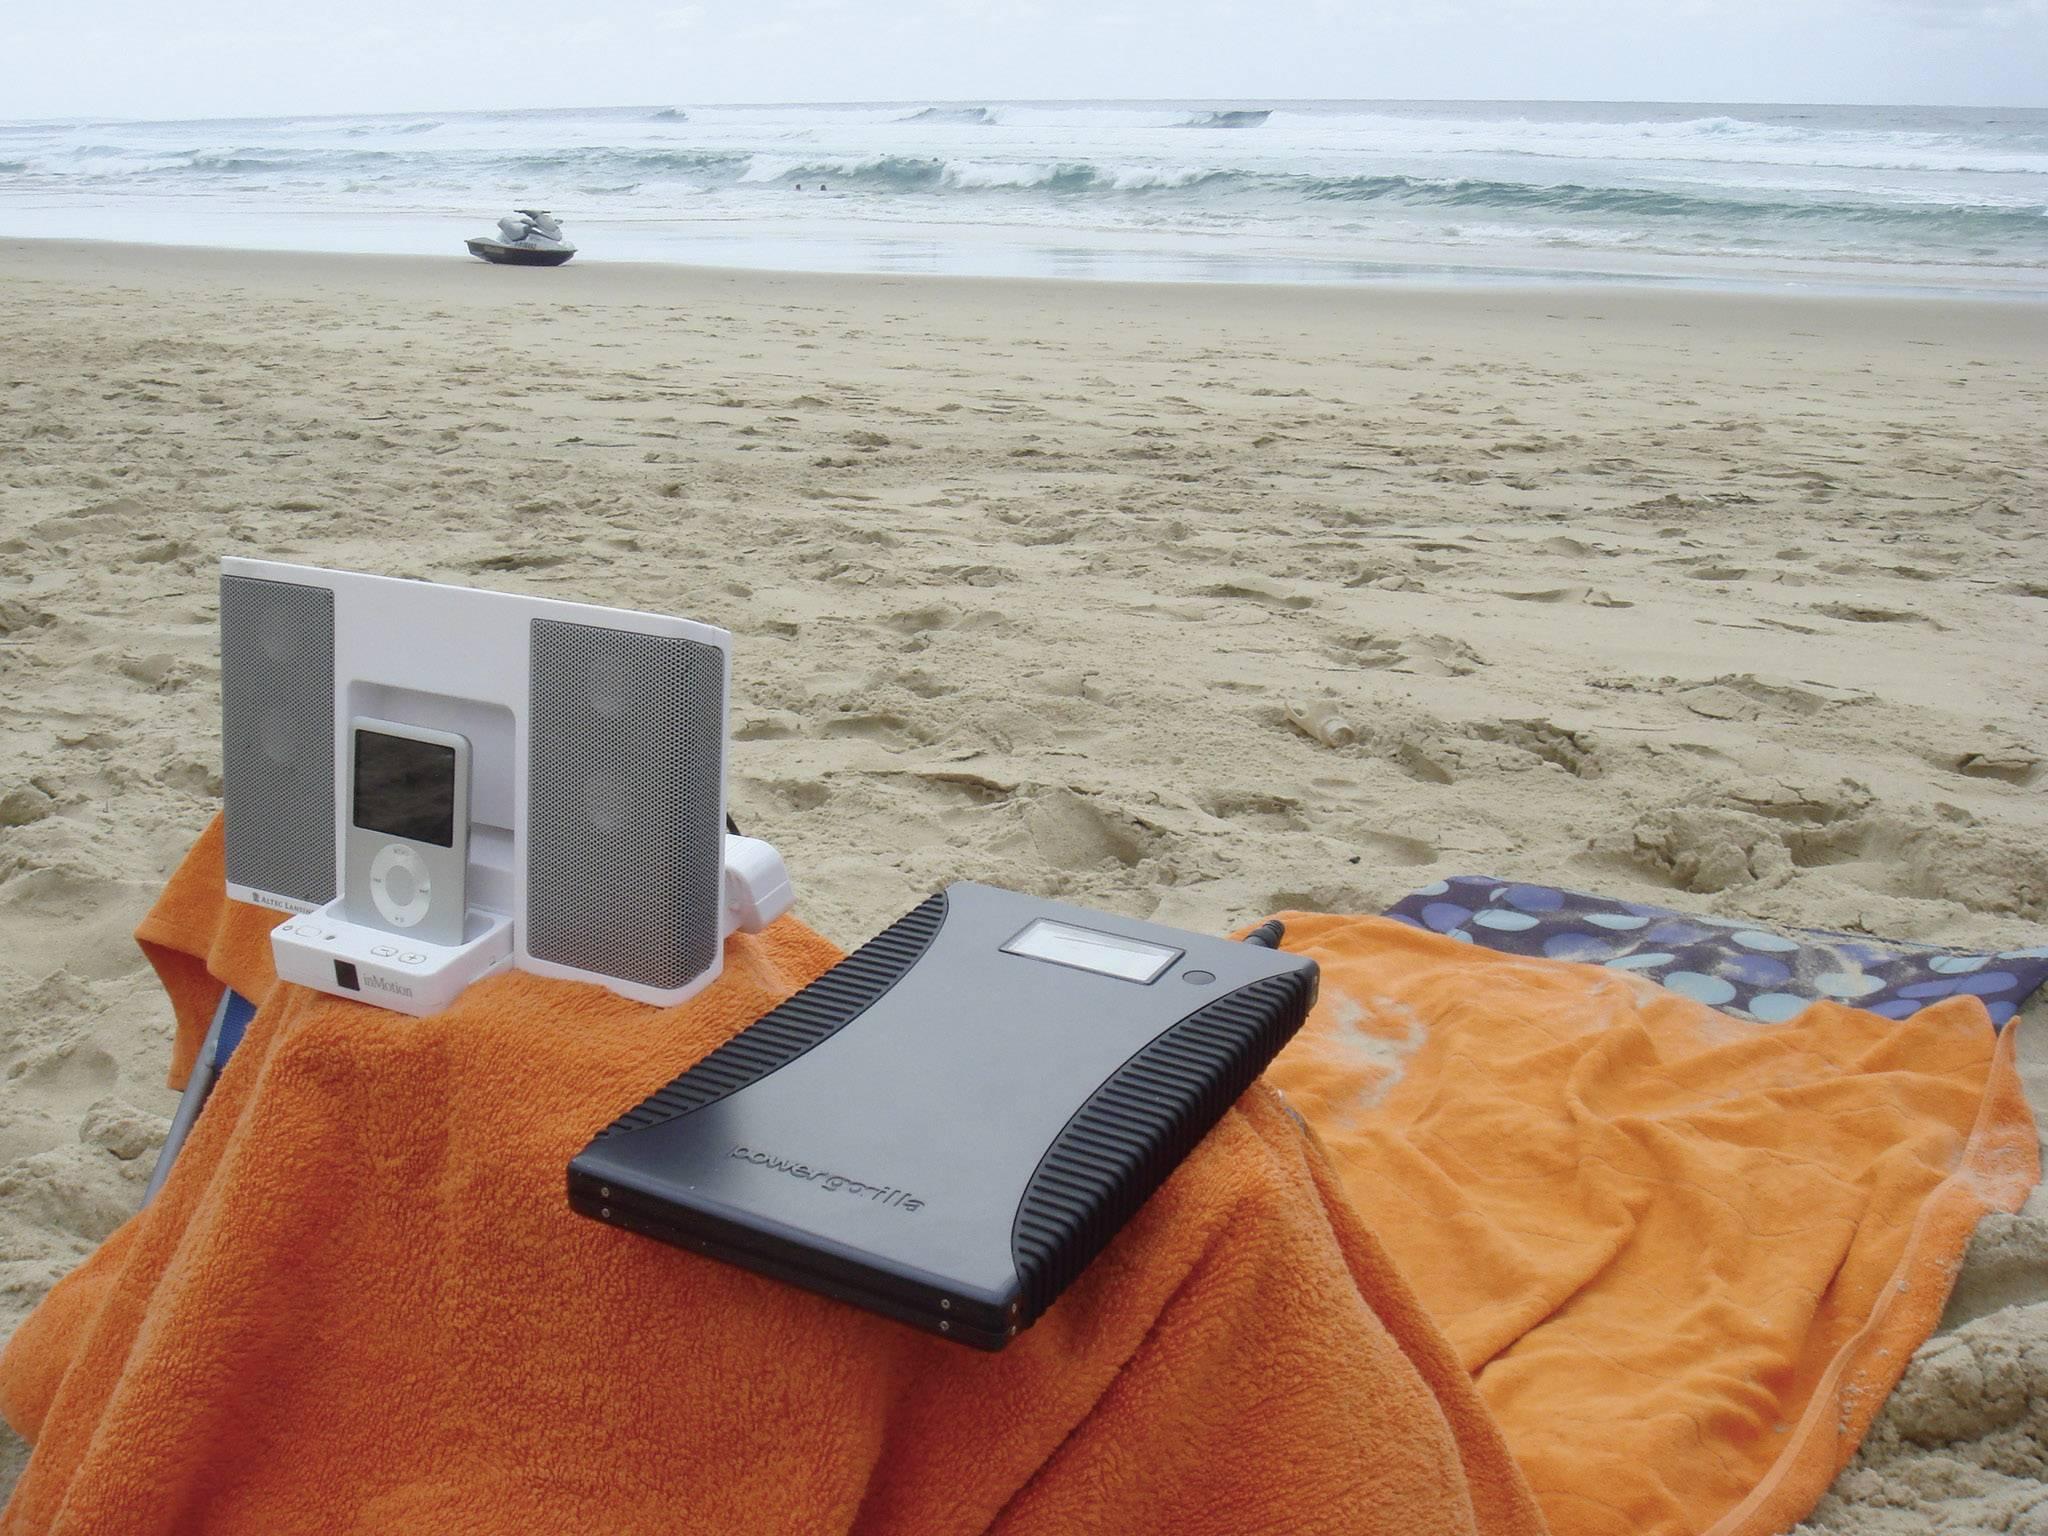 Mobilní powerbanka Powertraveller Powergorilla, Li-Pol 21000 mAh